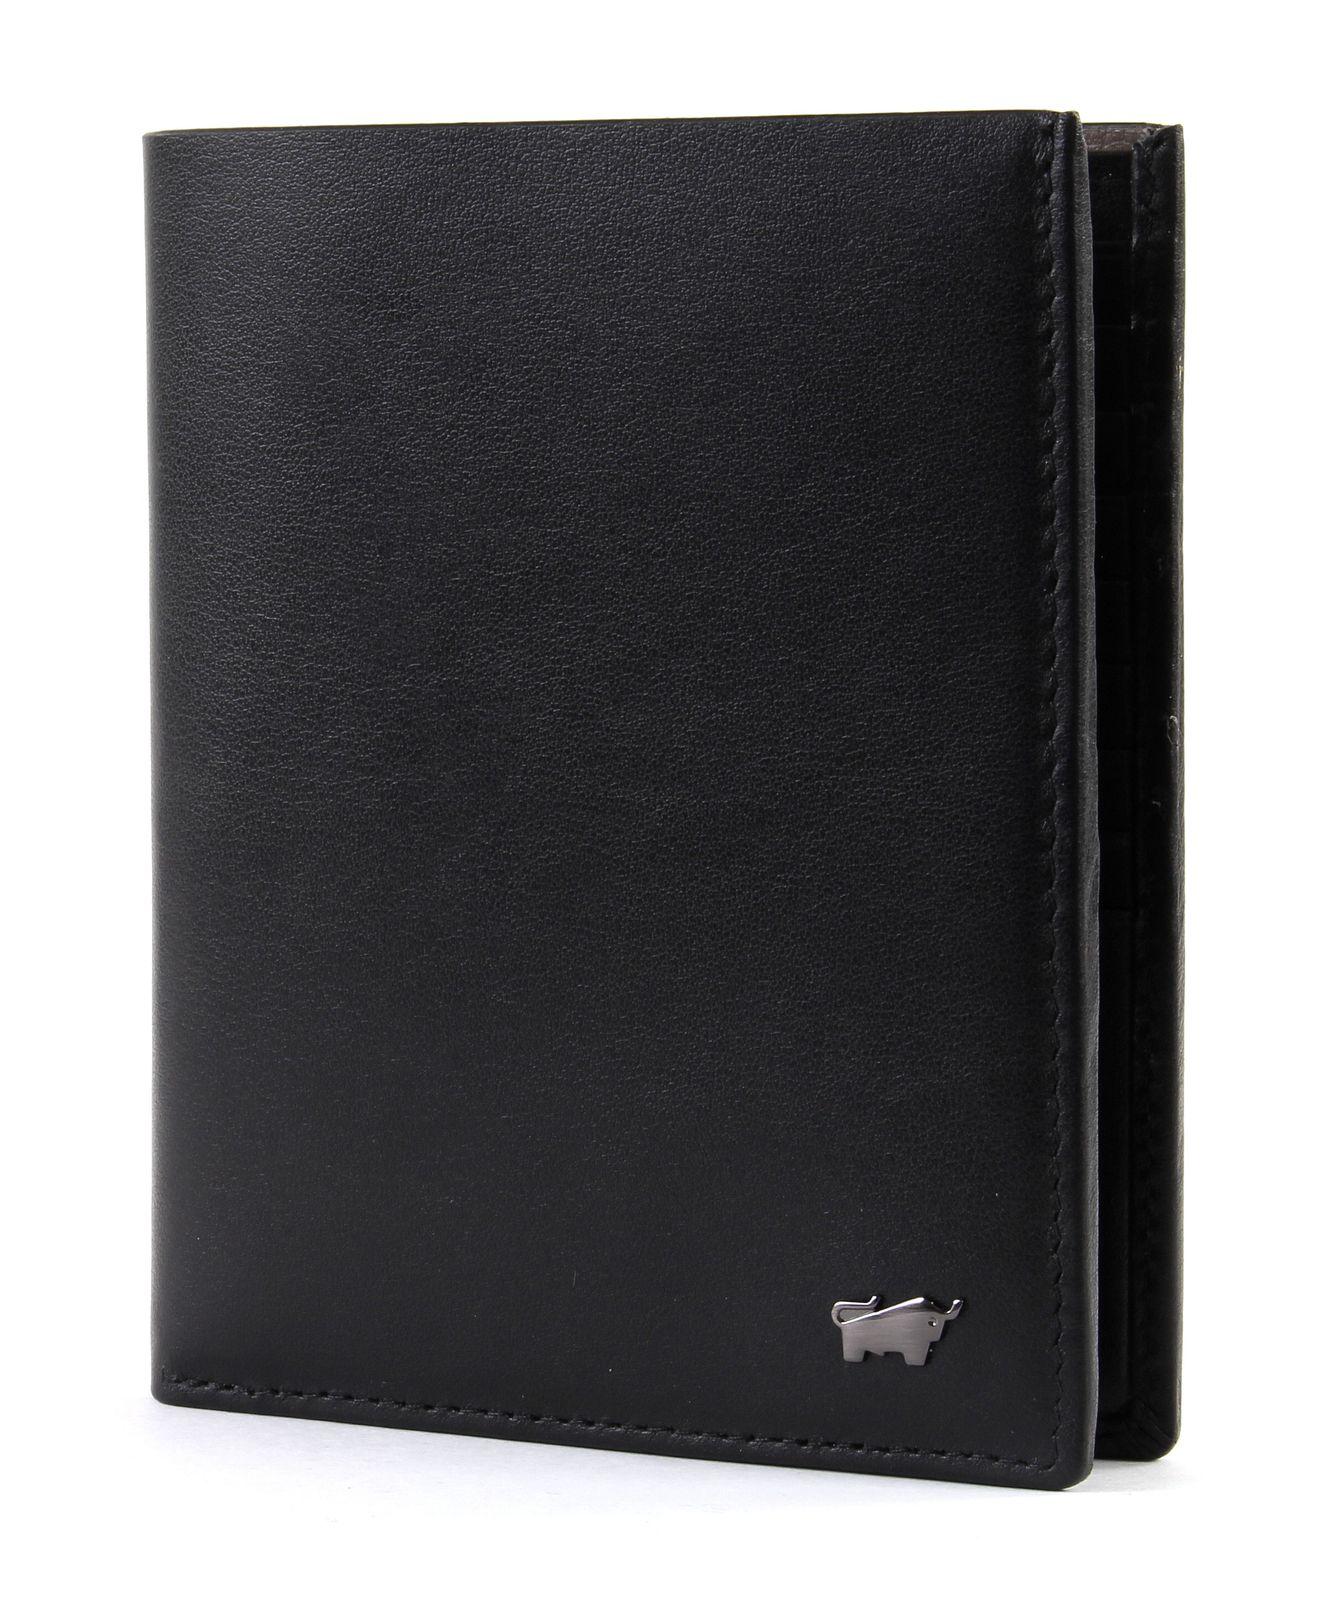 Braun b ffel livorno card case black for Case livorno